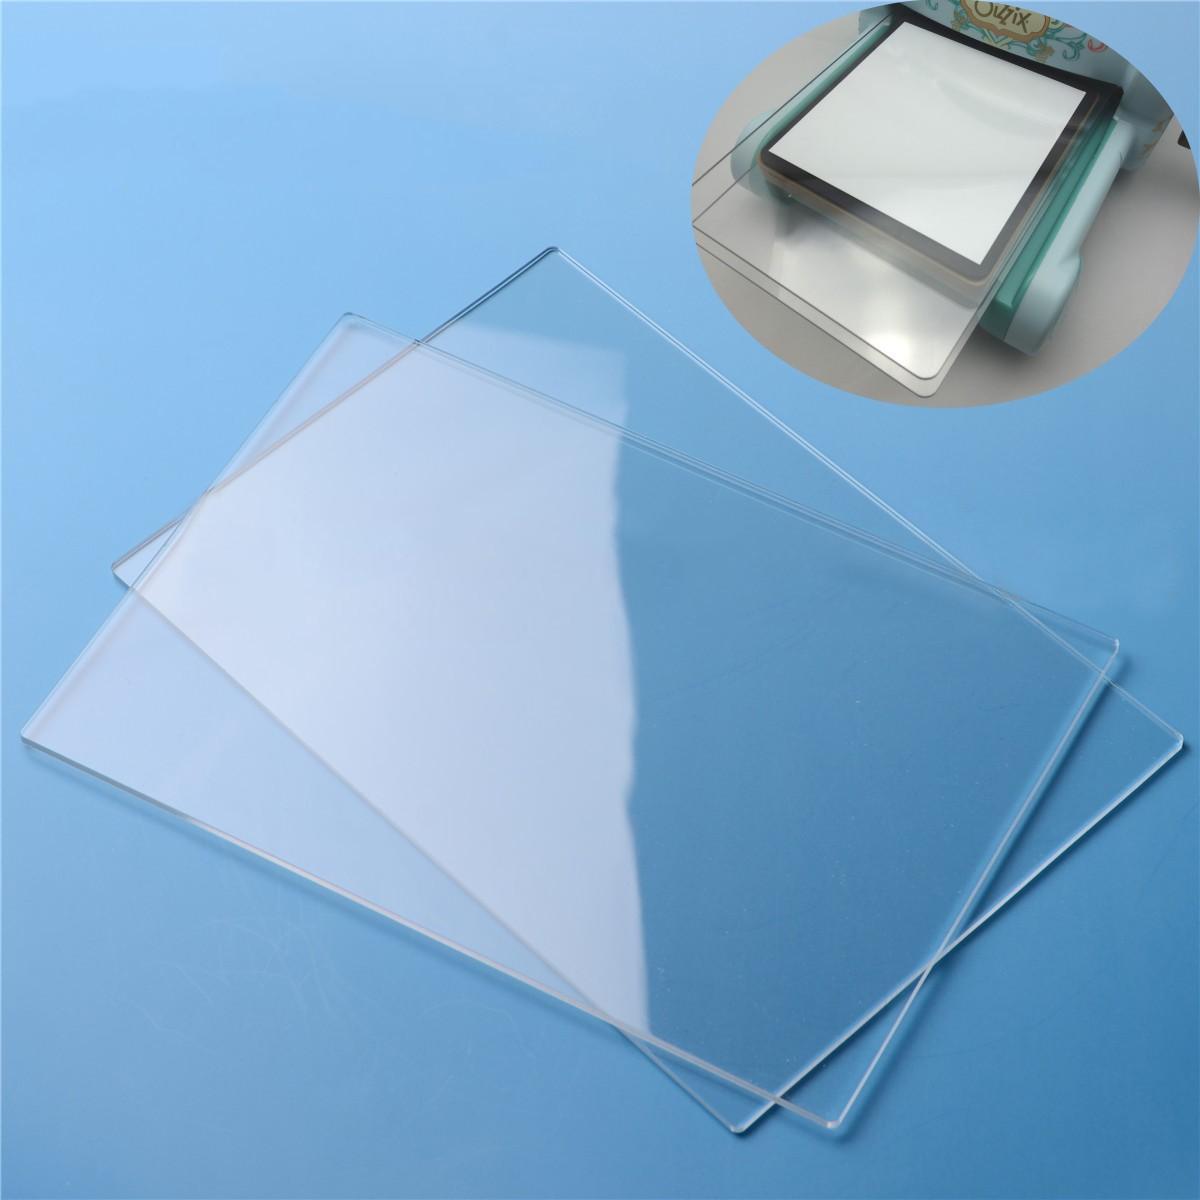 2pcs x 155mm*225mm*3mm Generic Acrylic Transparent Cutting Plates For Big Shot2pcs x 155mm*225mm*3mm Generic Acrylic Transparent Cutting Plates For Big Shot